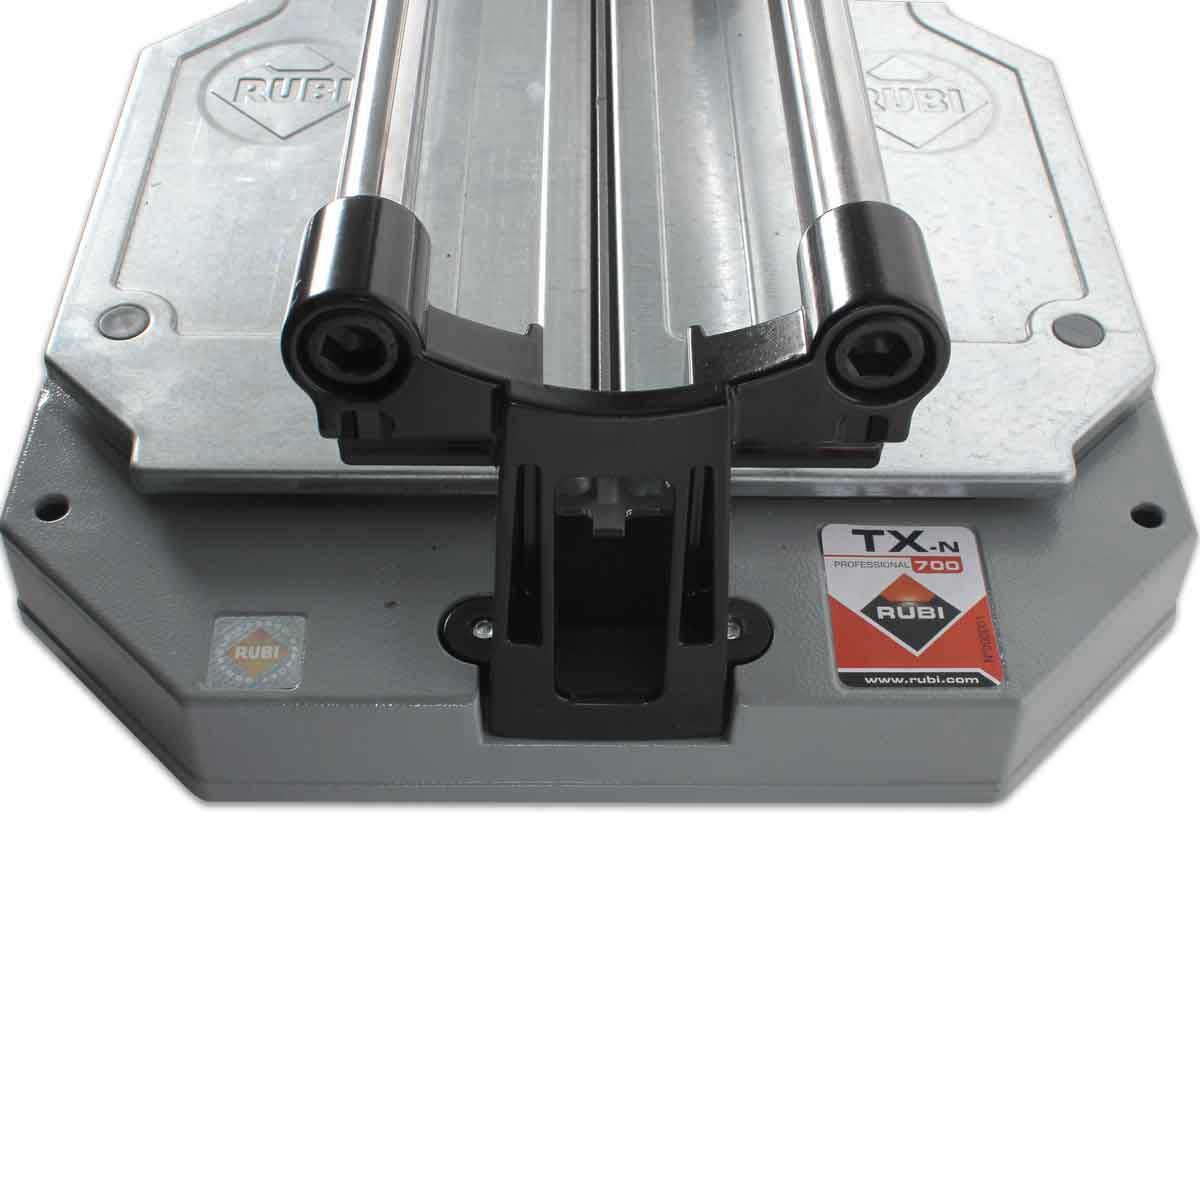 Rubi TX-N Tile Cutter base